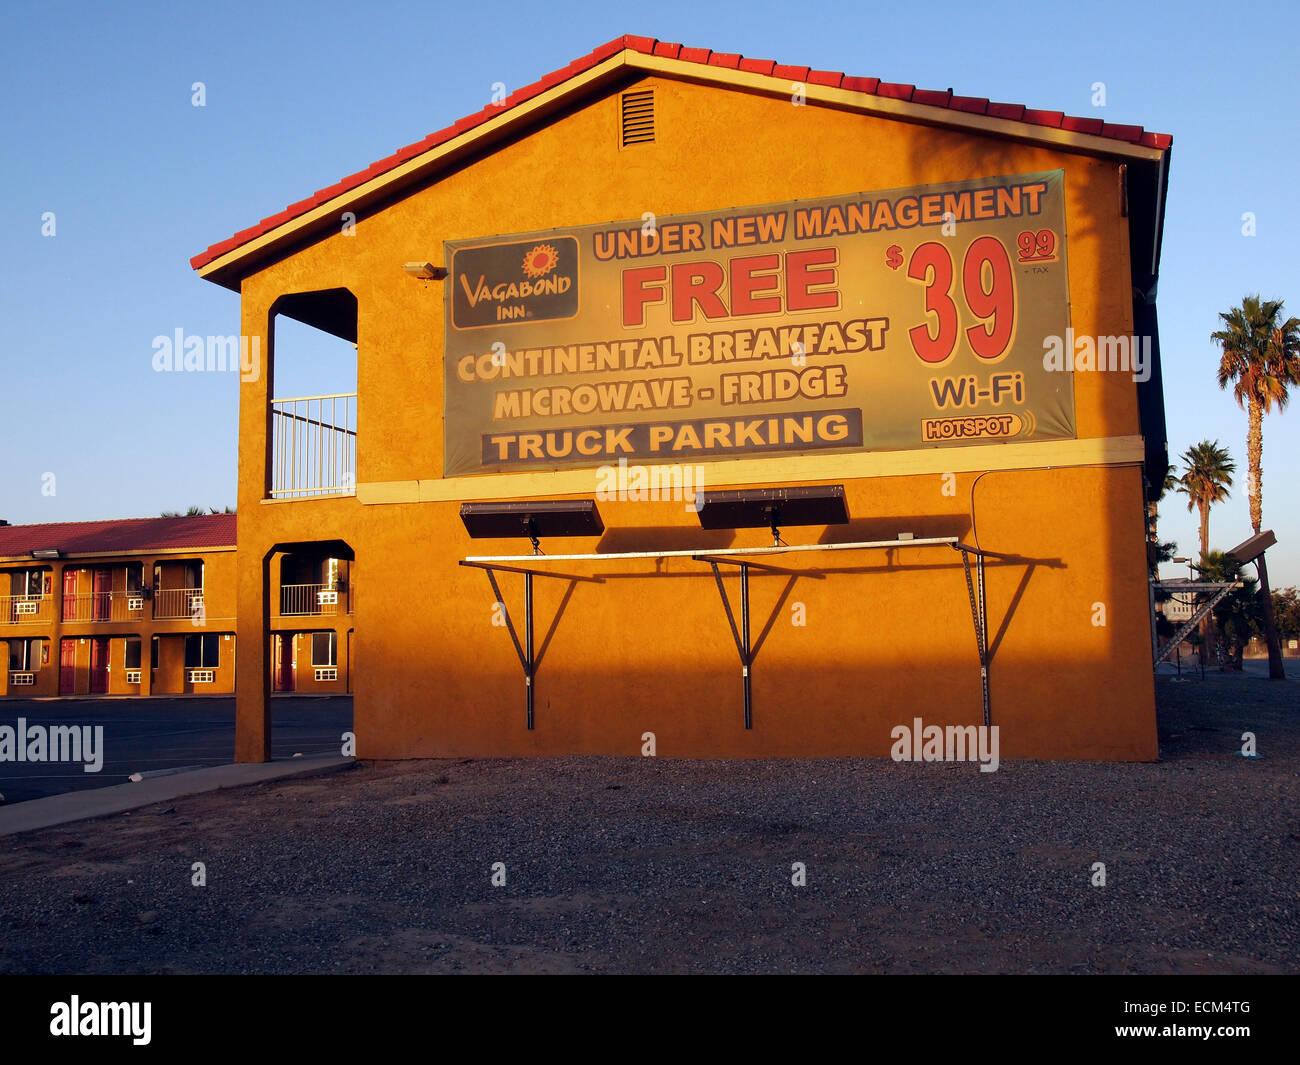 Vagabond Inn motel, Buttonwillow, San Joaquin Valley, California, - Stock Image